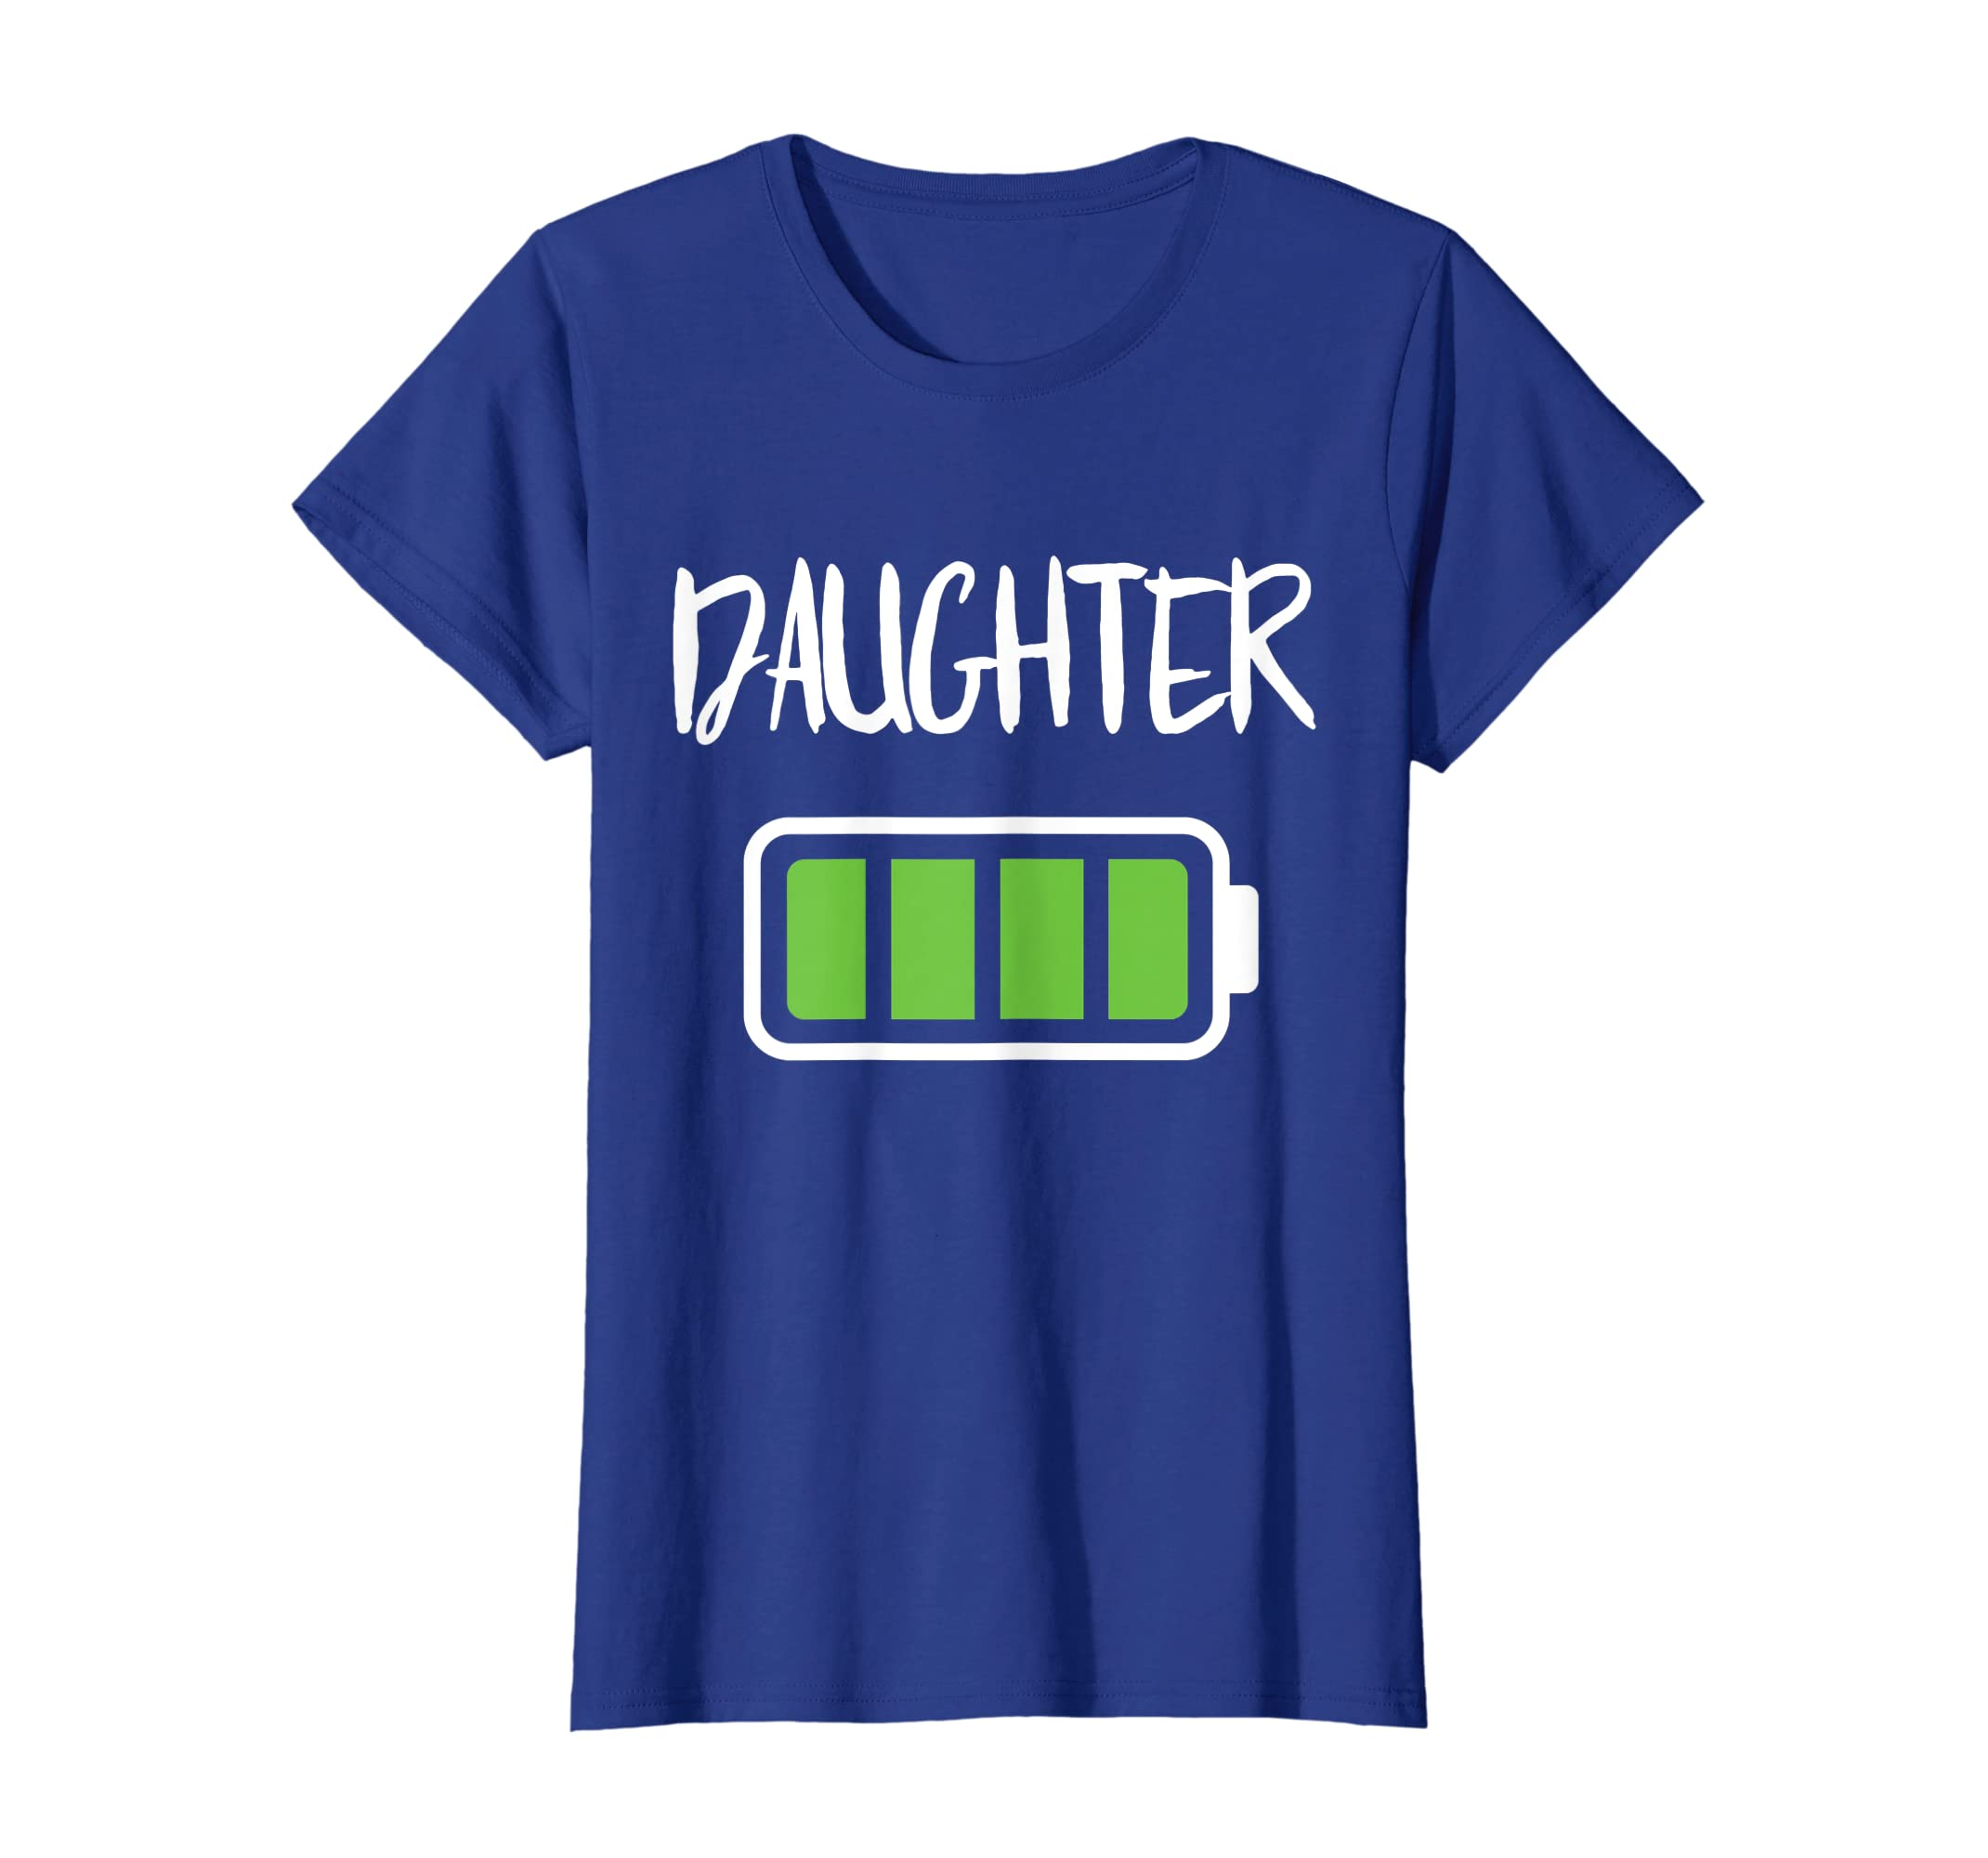 38ddeb7155 Amazon.com: Mommy Daughter Battery T-Shirt Full Battery Energy Shirt:  Clothing